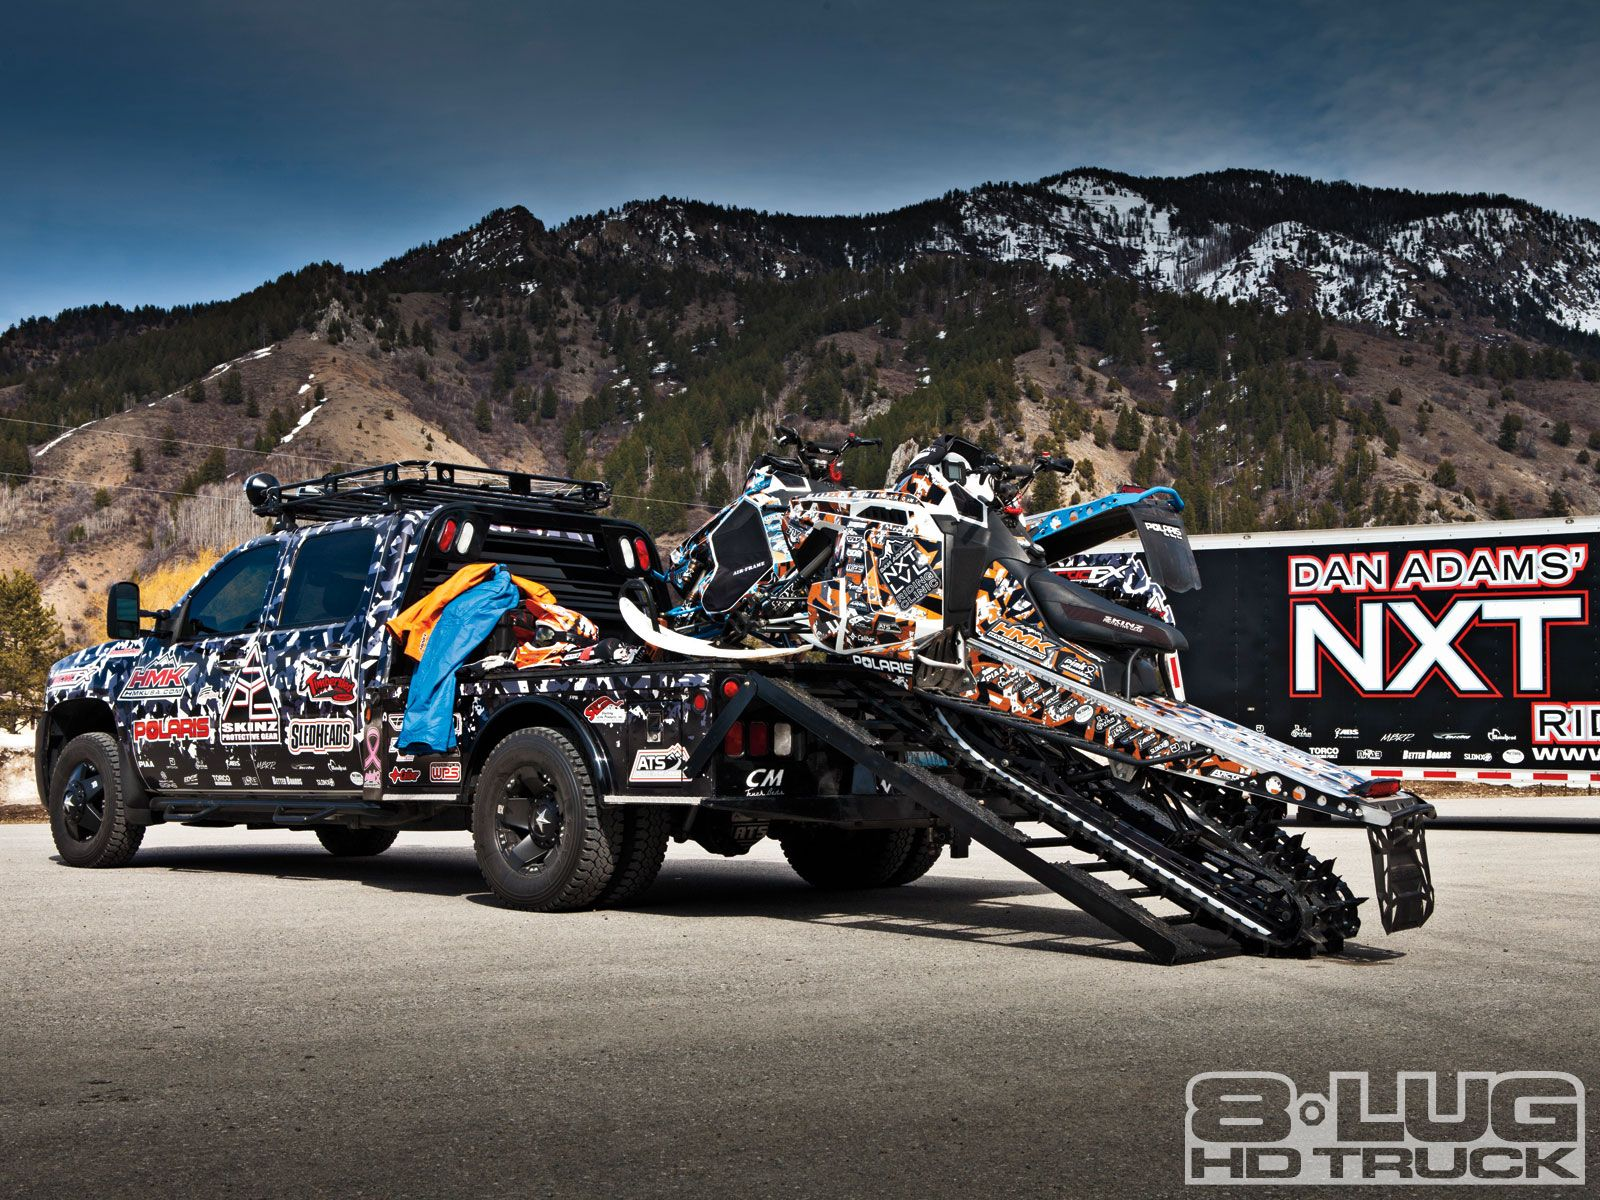 dan adams nxt level riding clinic http www reflexsnowmobiling